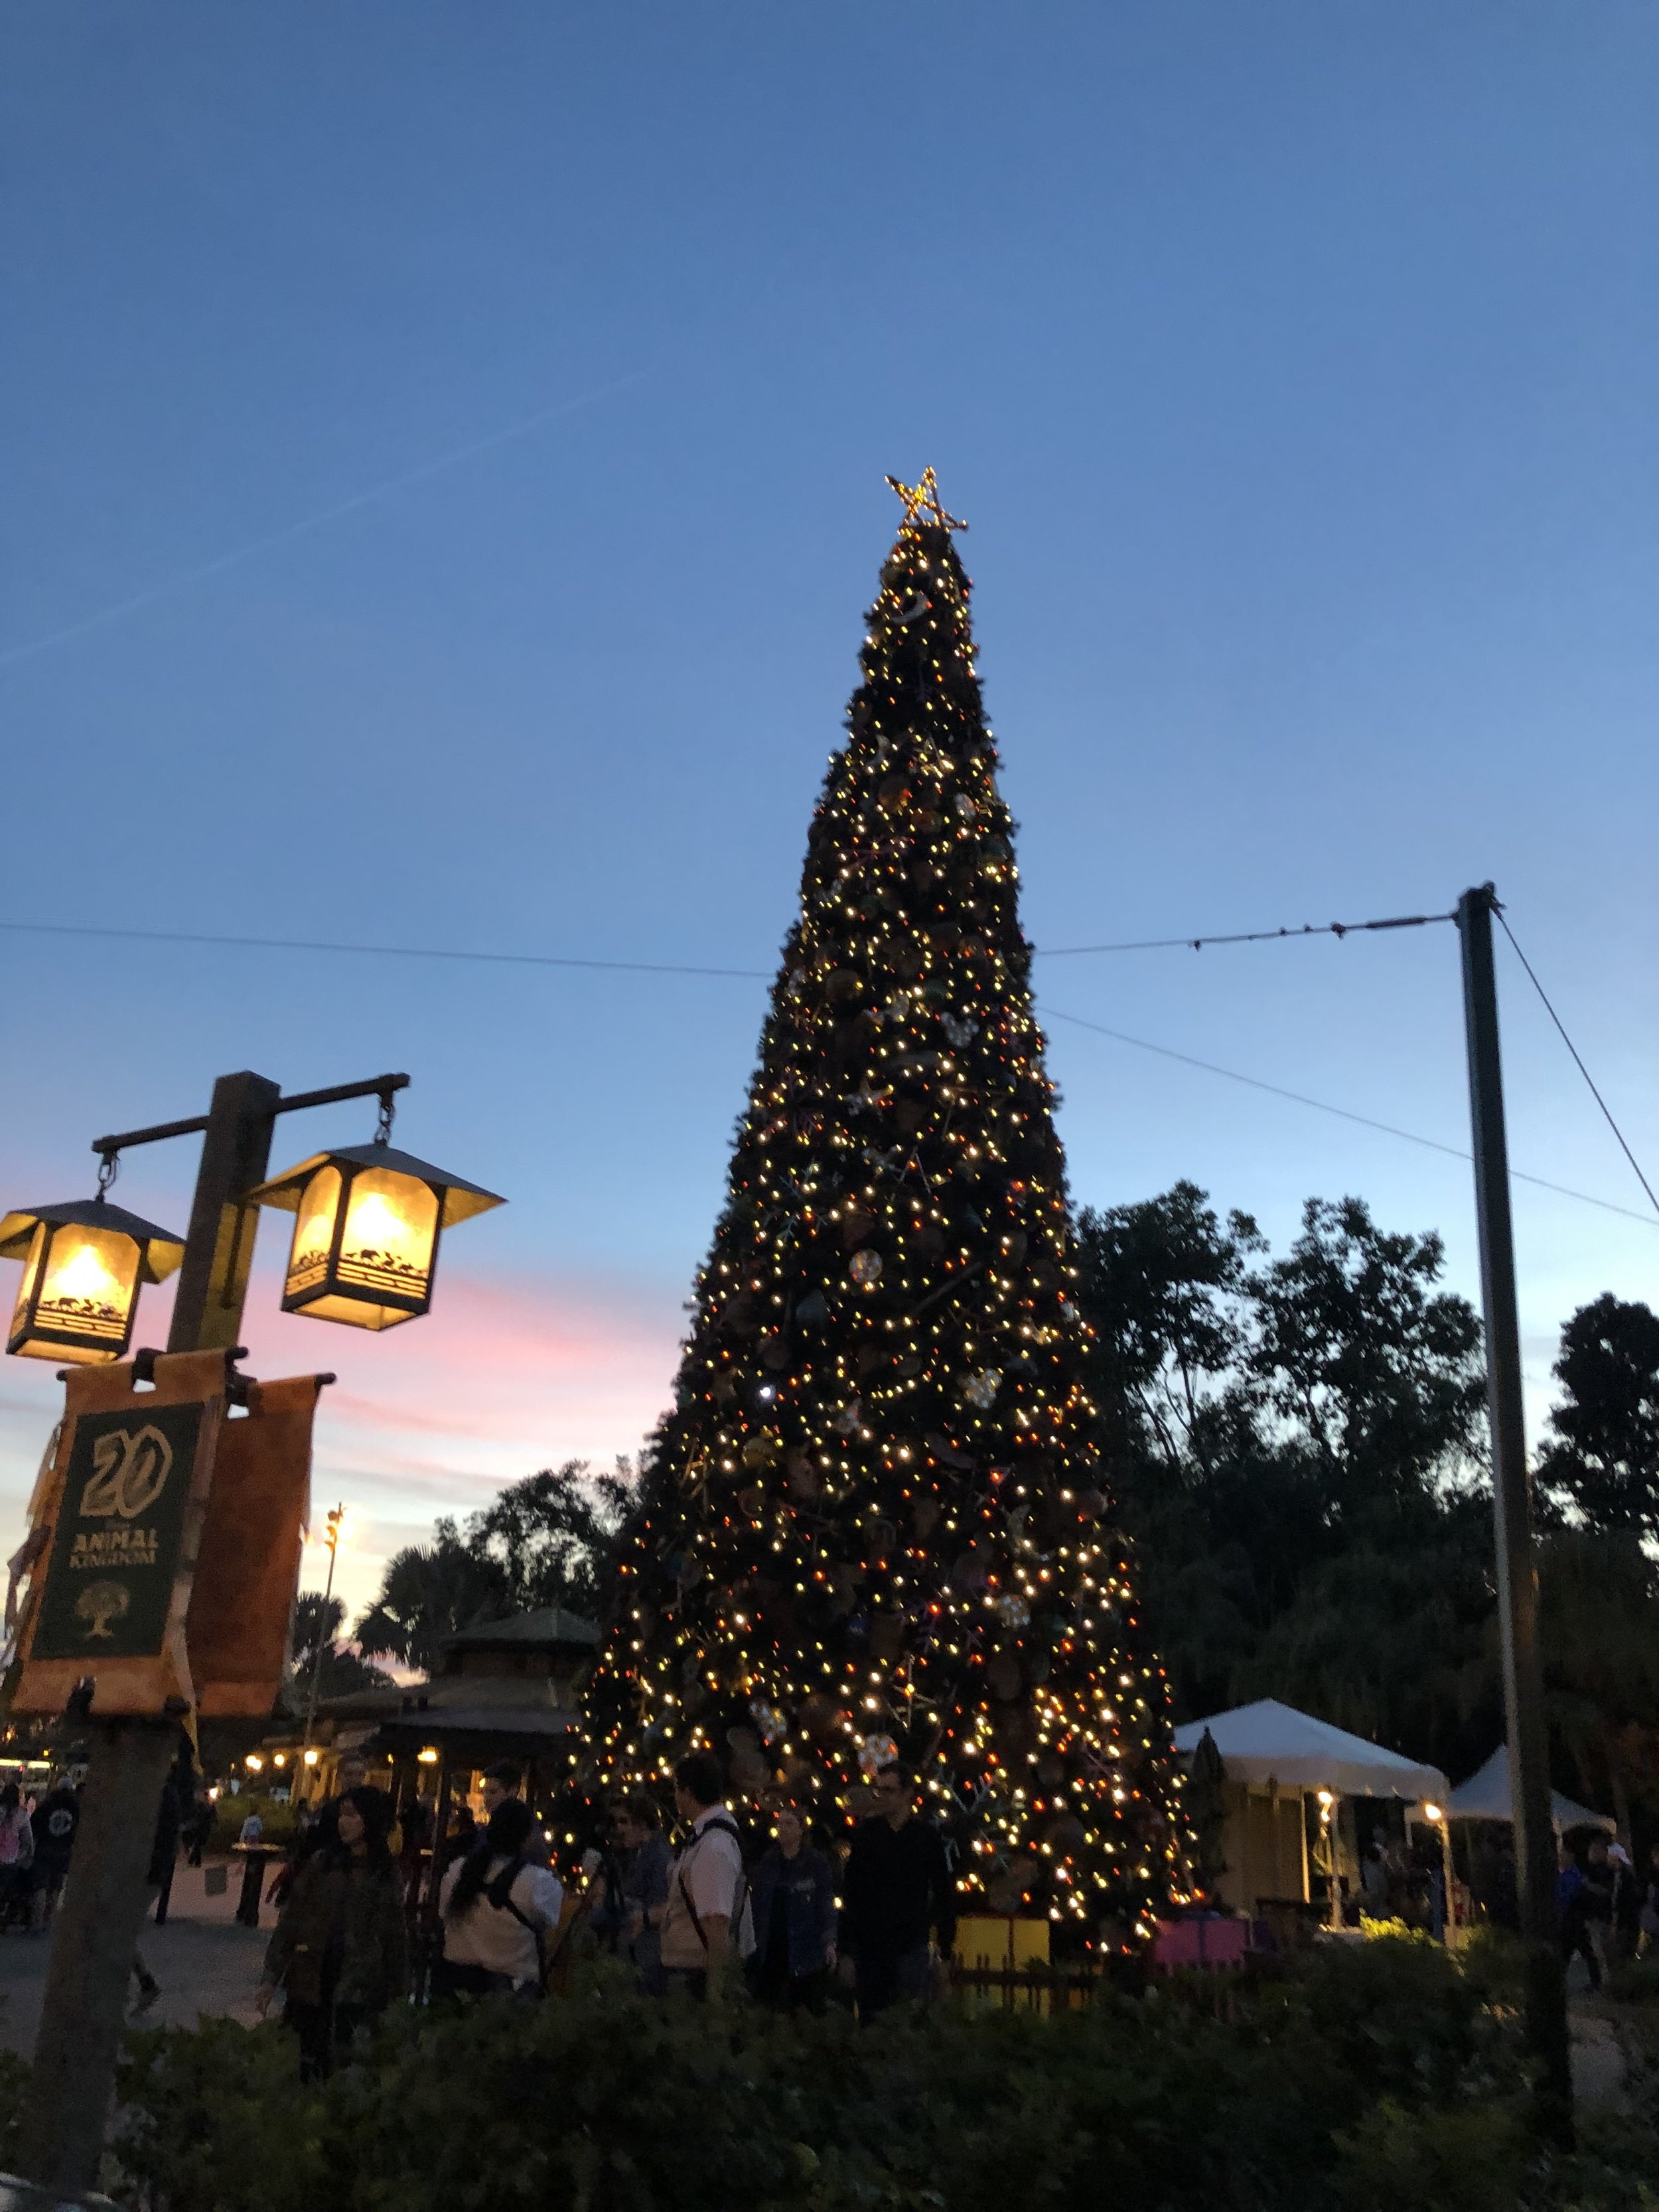 Animal Kingdom's 2018 Christmas Tree - celebrating 20 years!